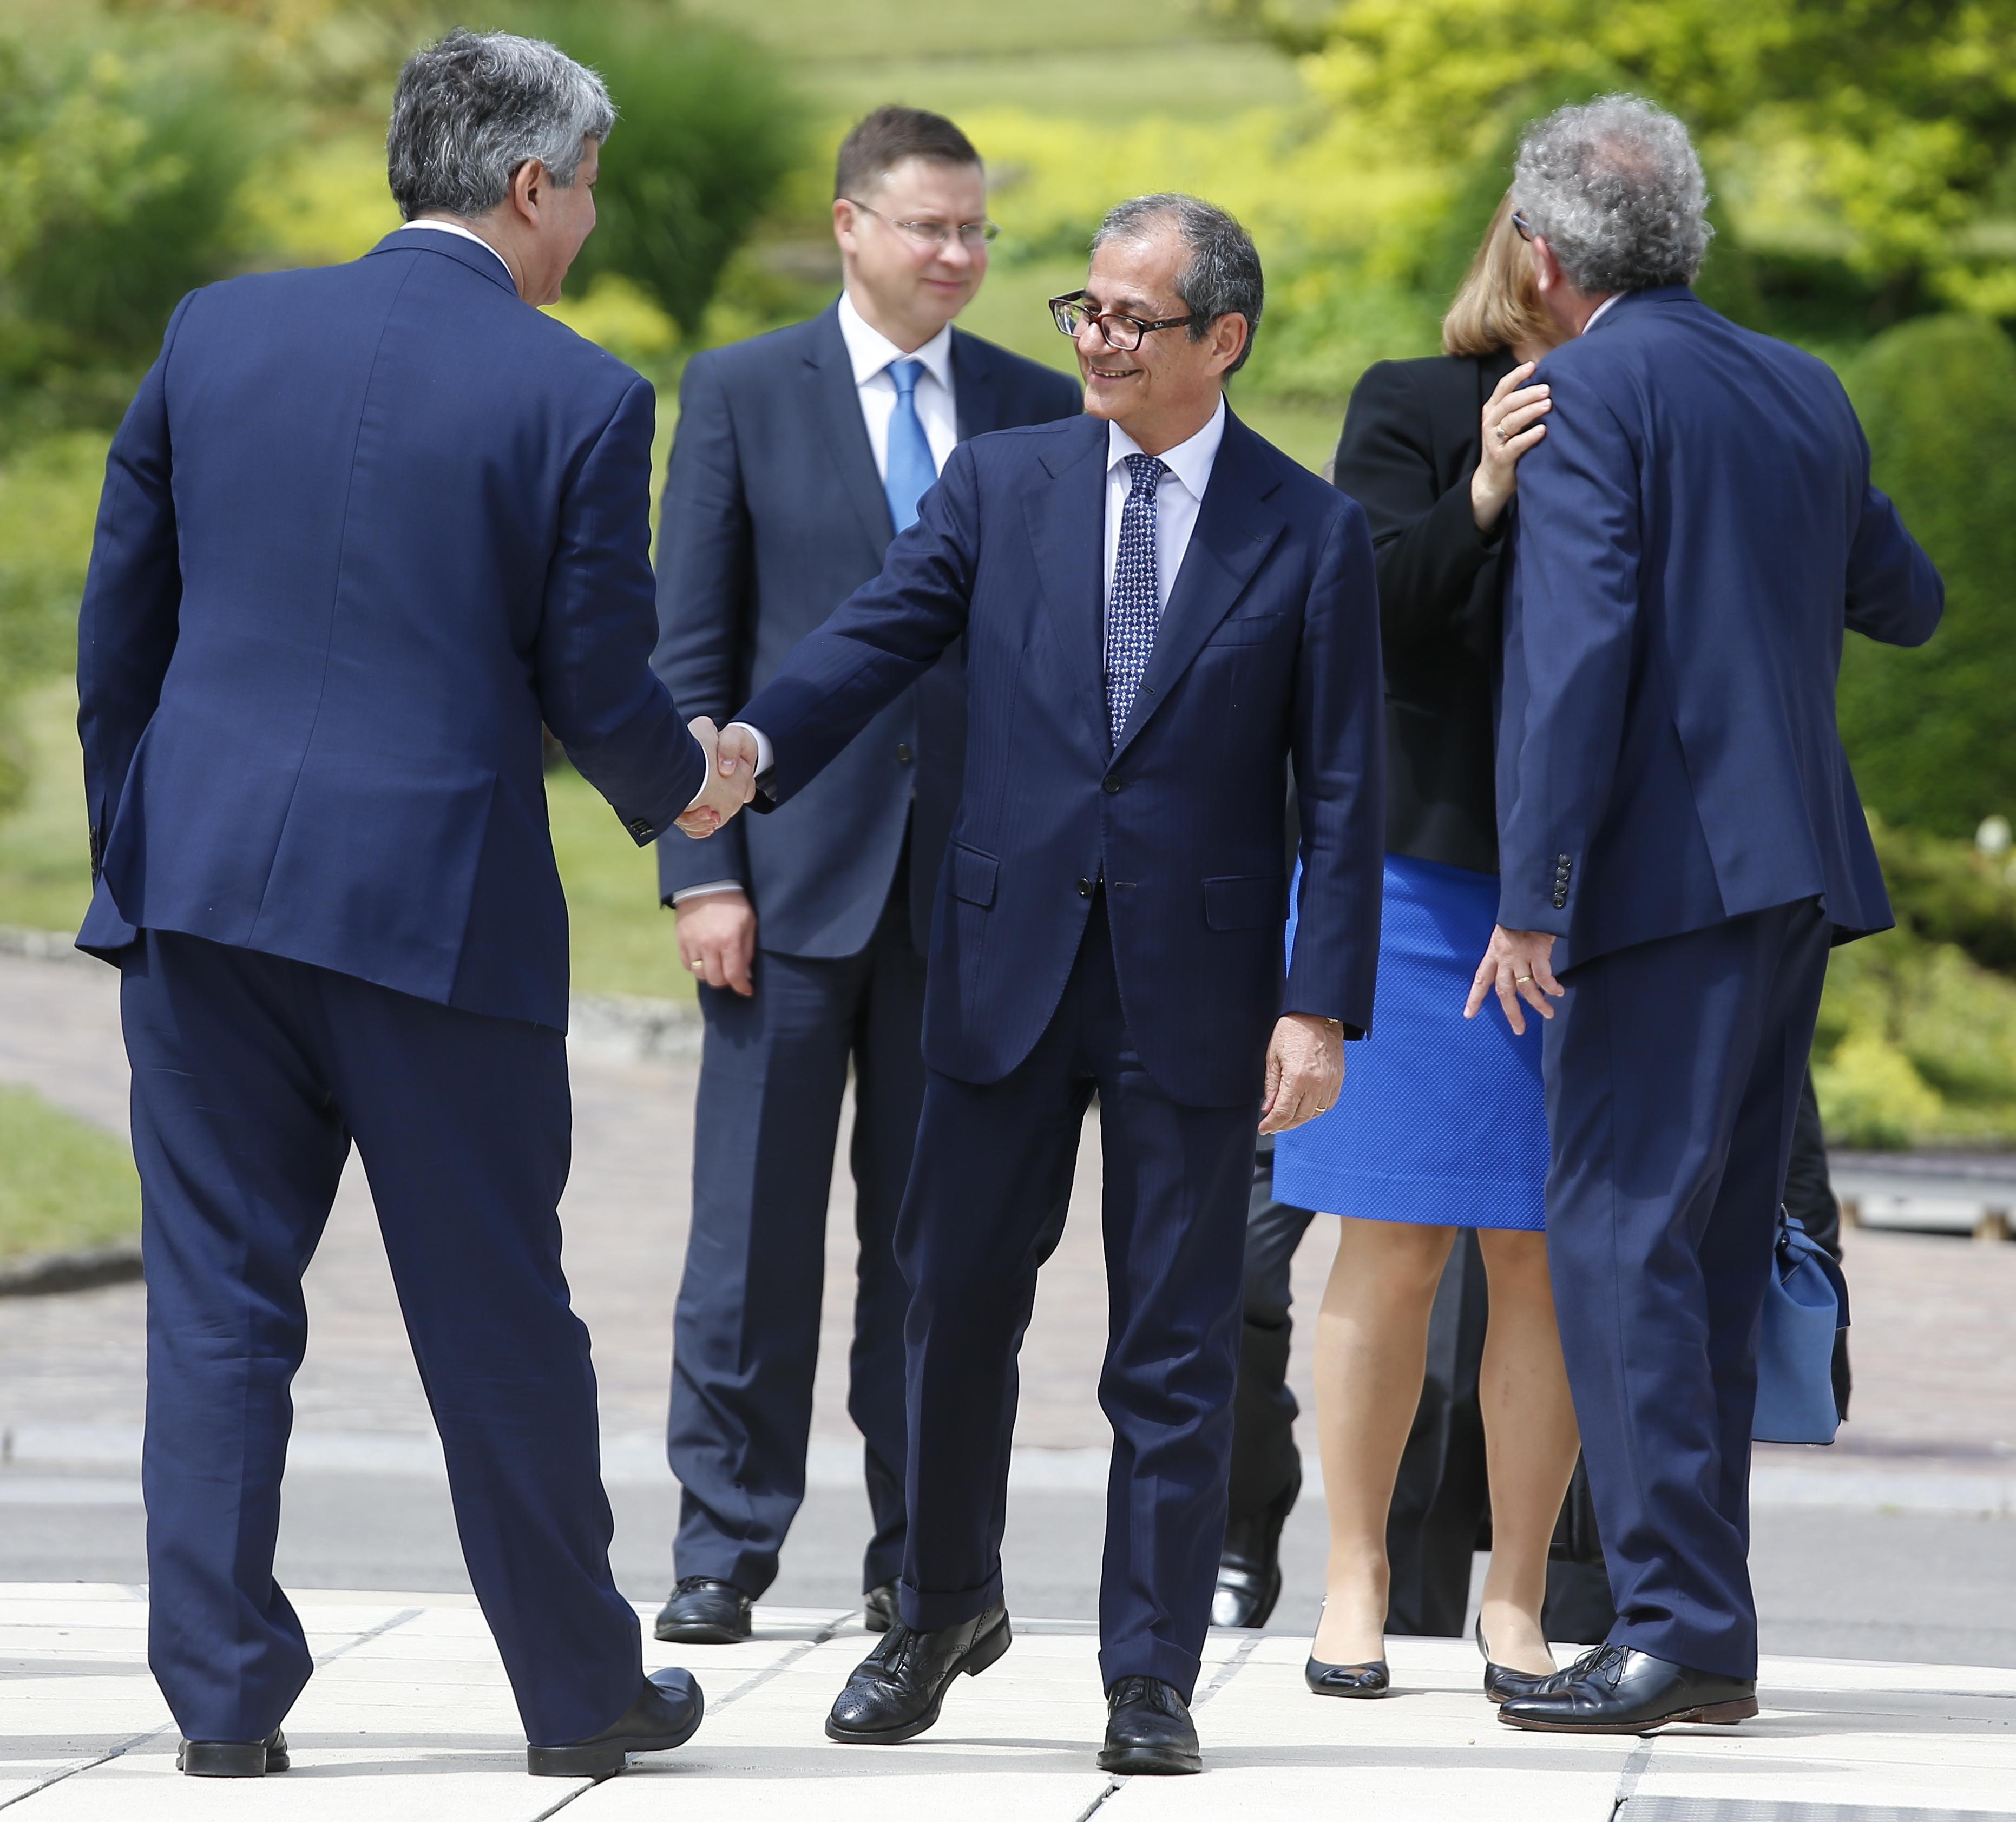 kare-kare-to-krisimo-eurogroup-fotografies11